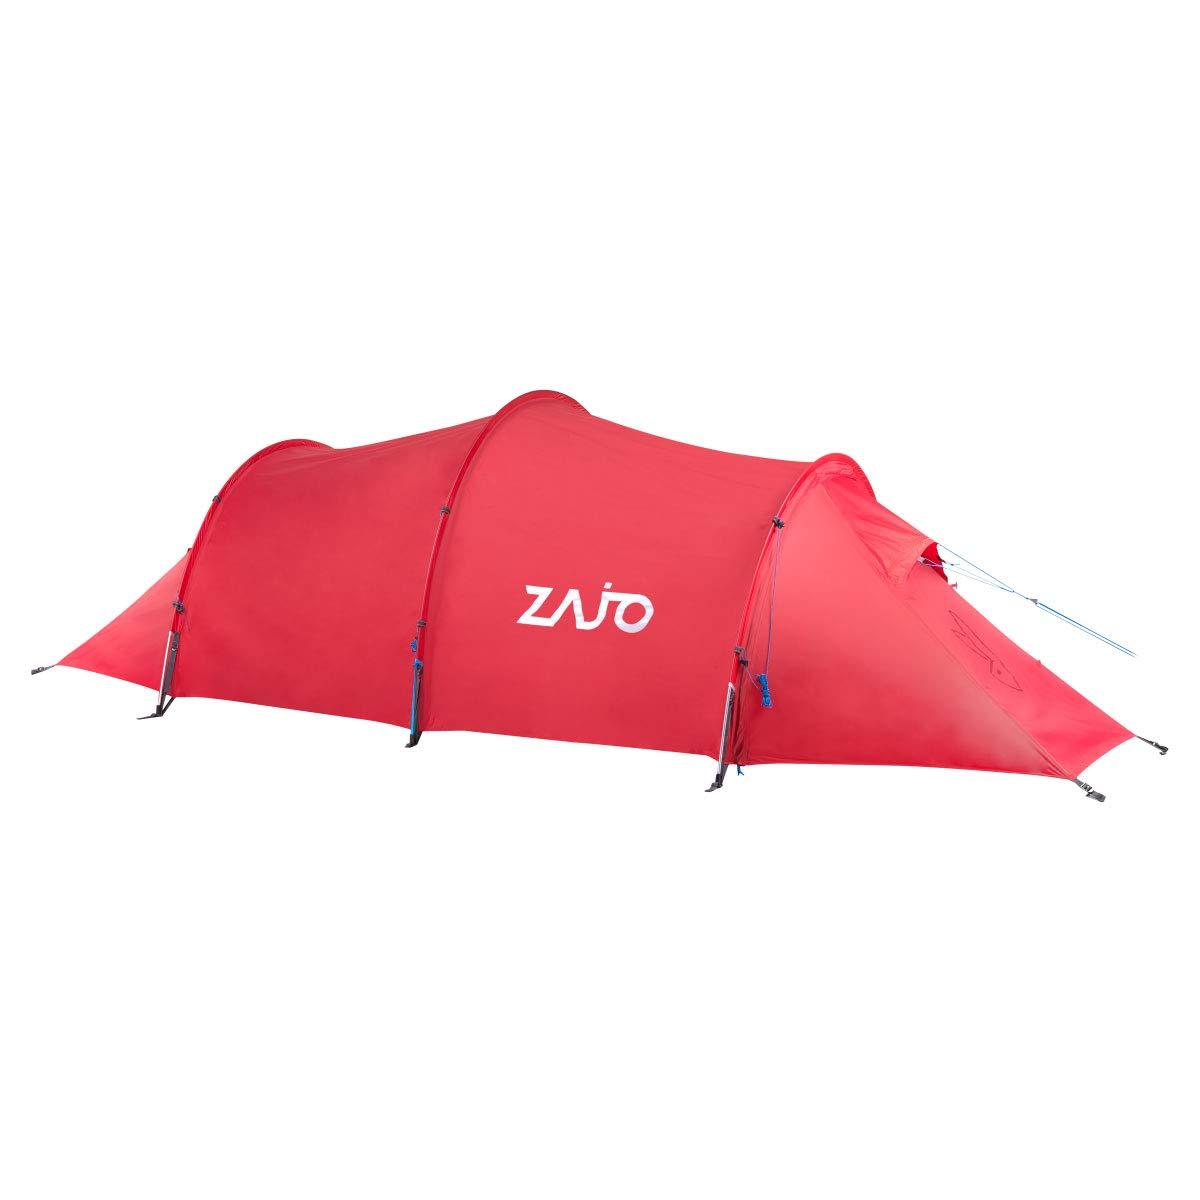 Zajo Tunnelzelt Lapland 4 Personen Trekkingzelt Outdoor Zelt